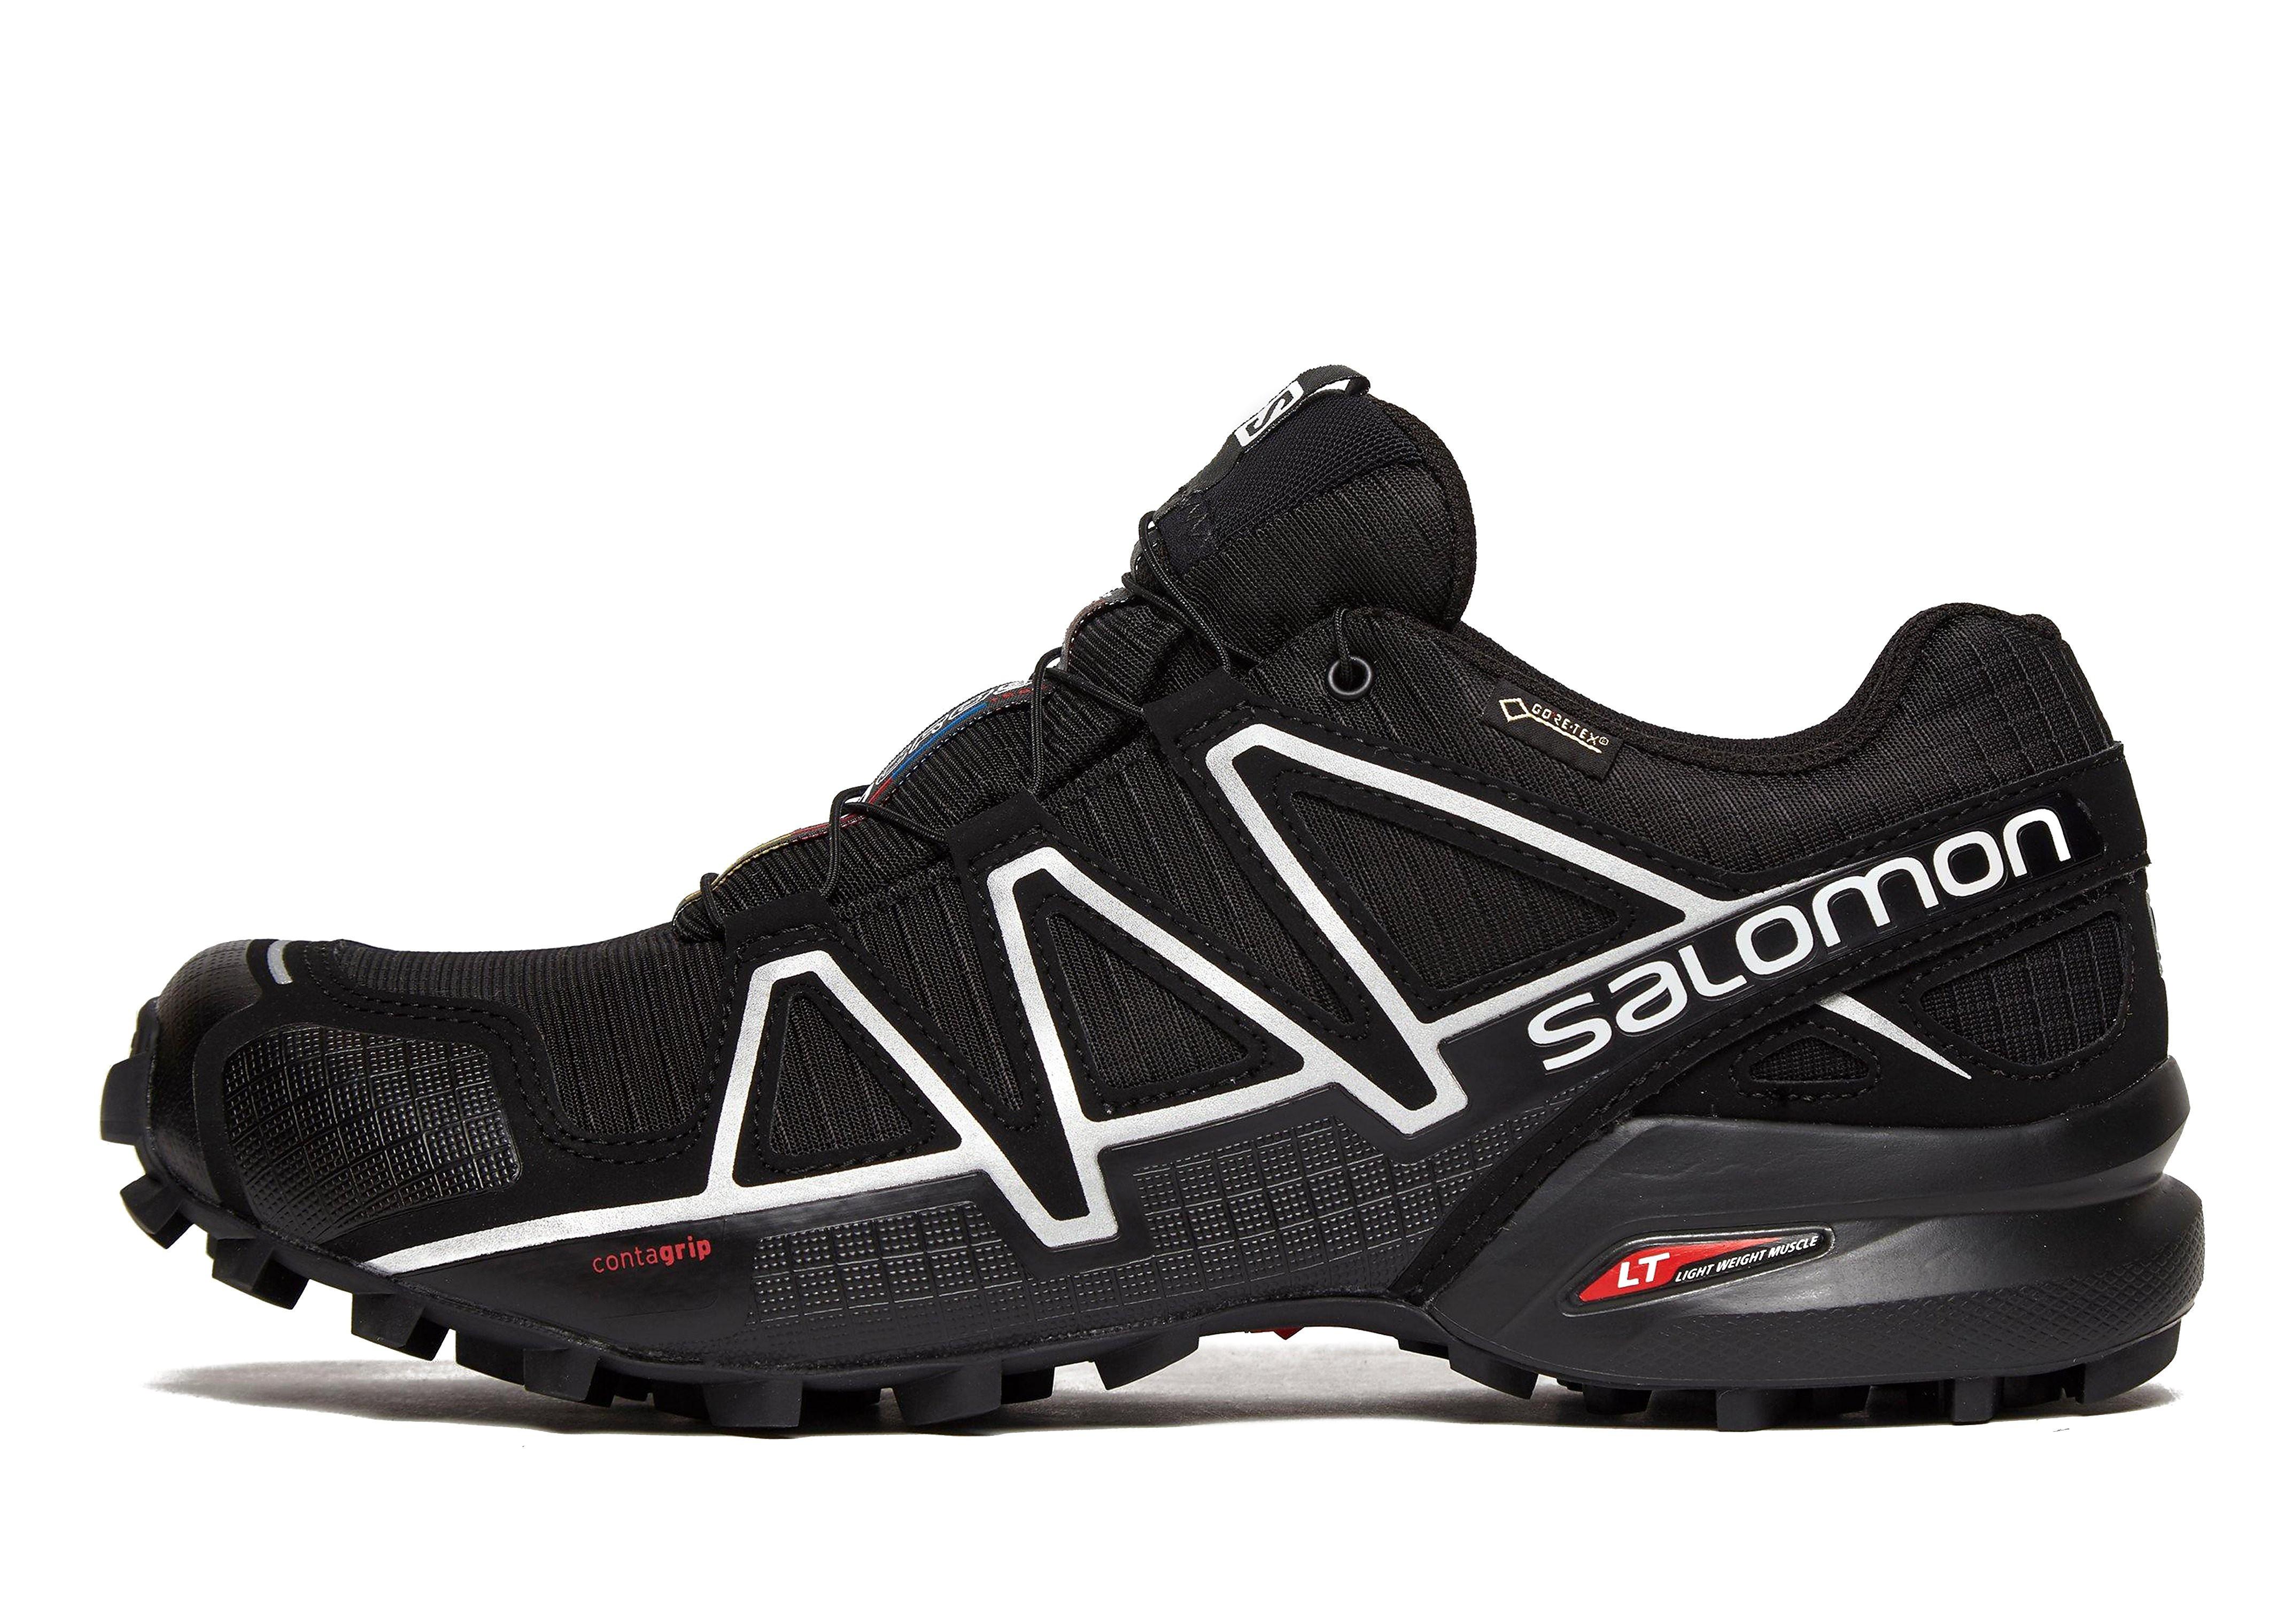 Salomon Speedcross 4 GTX Trail